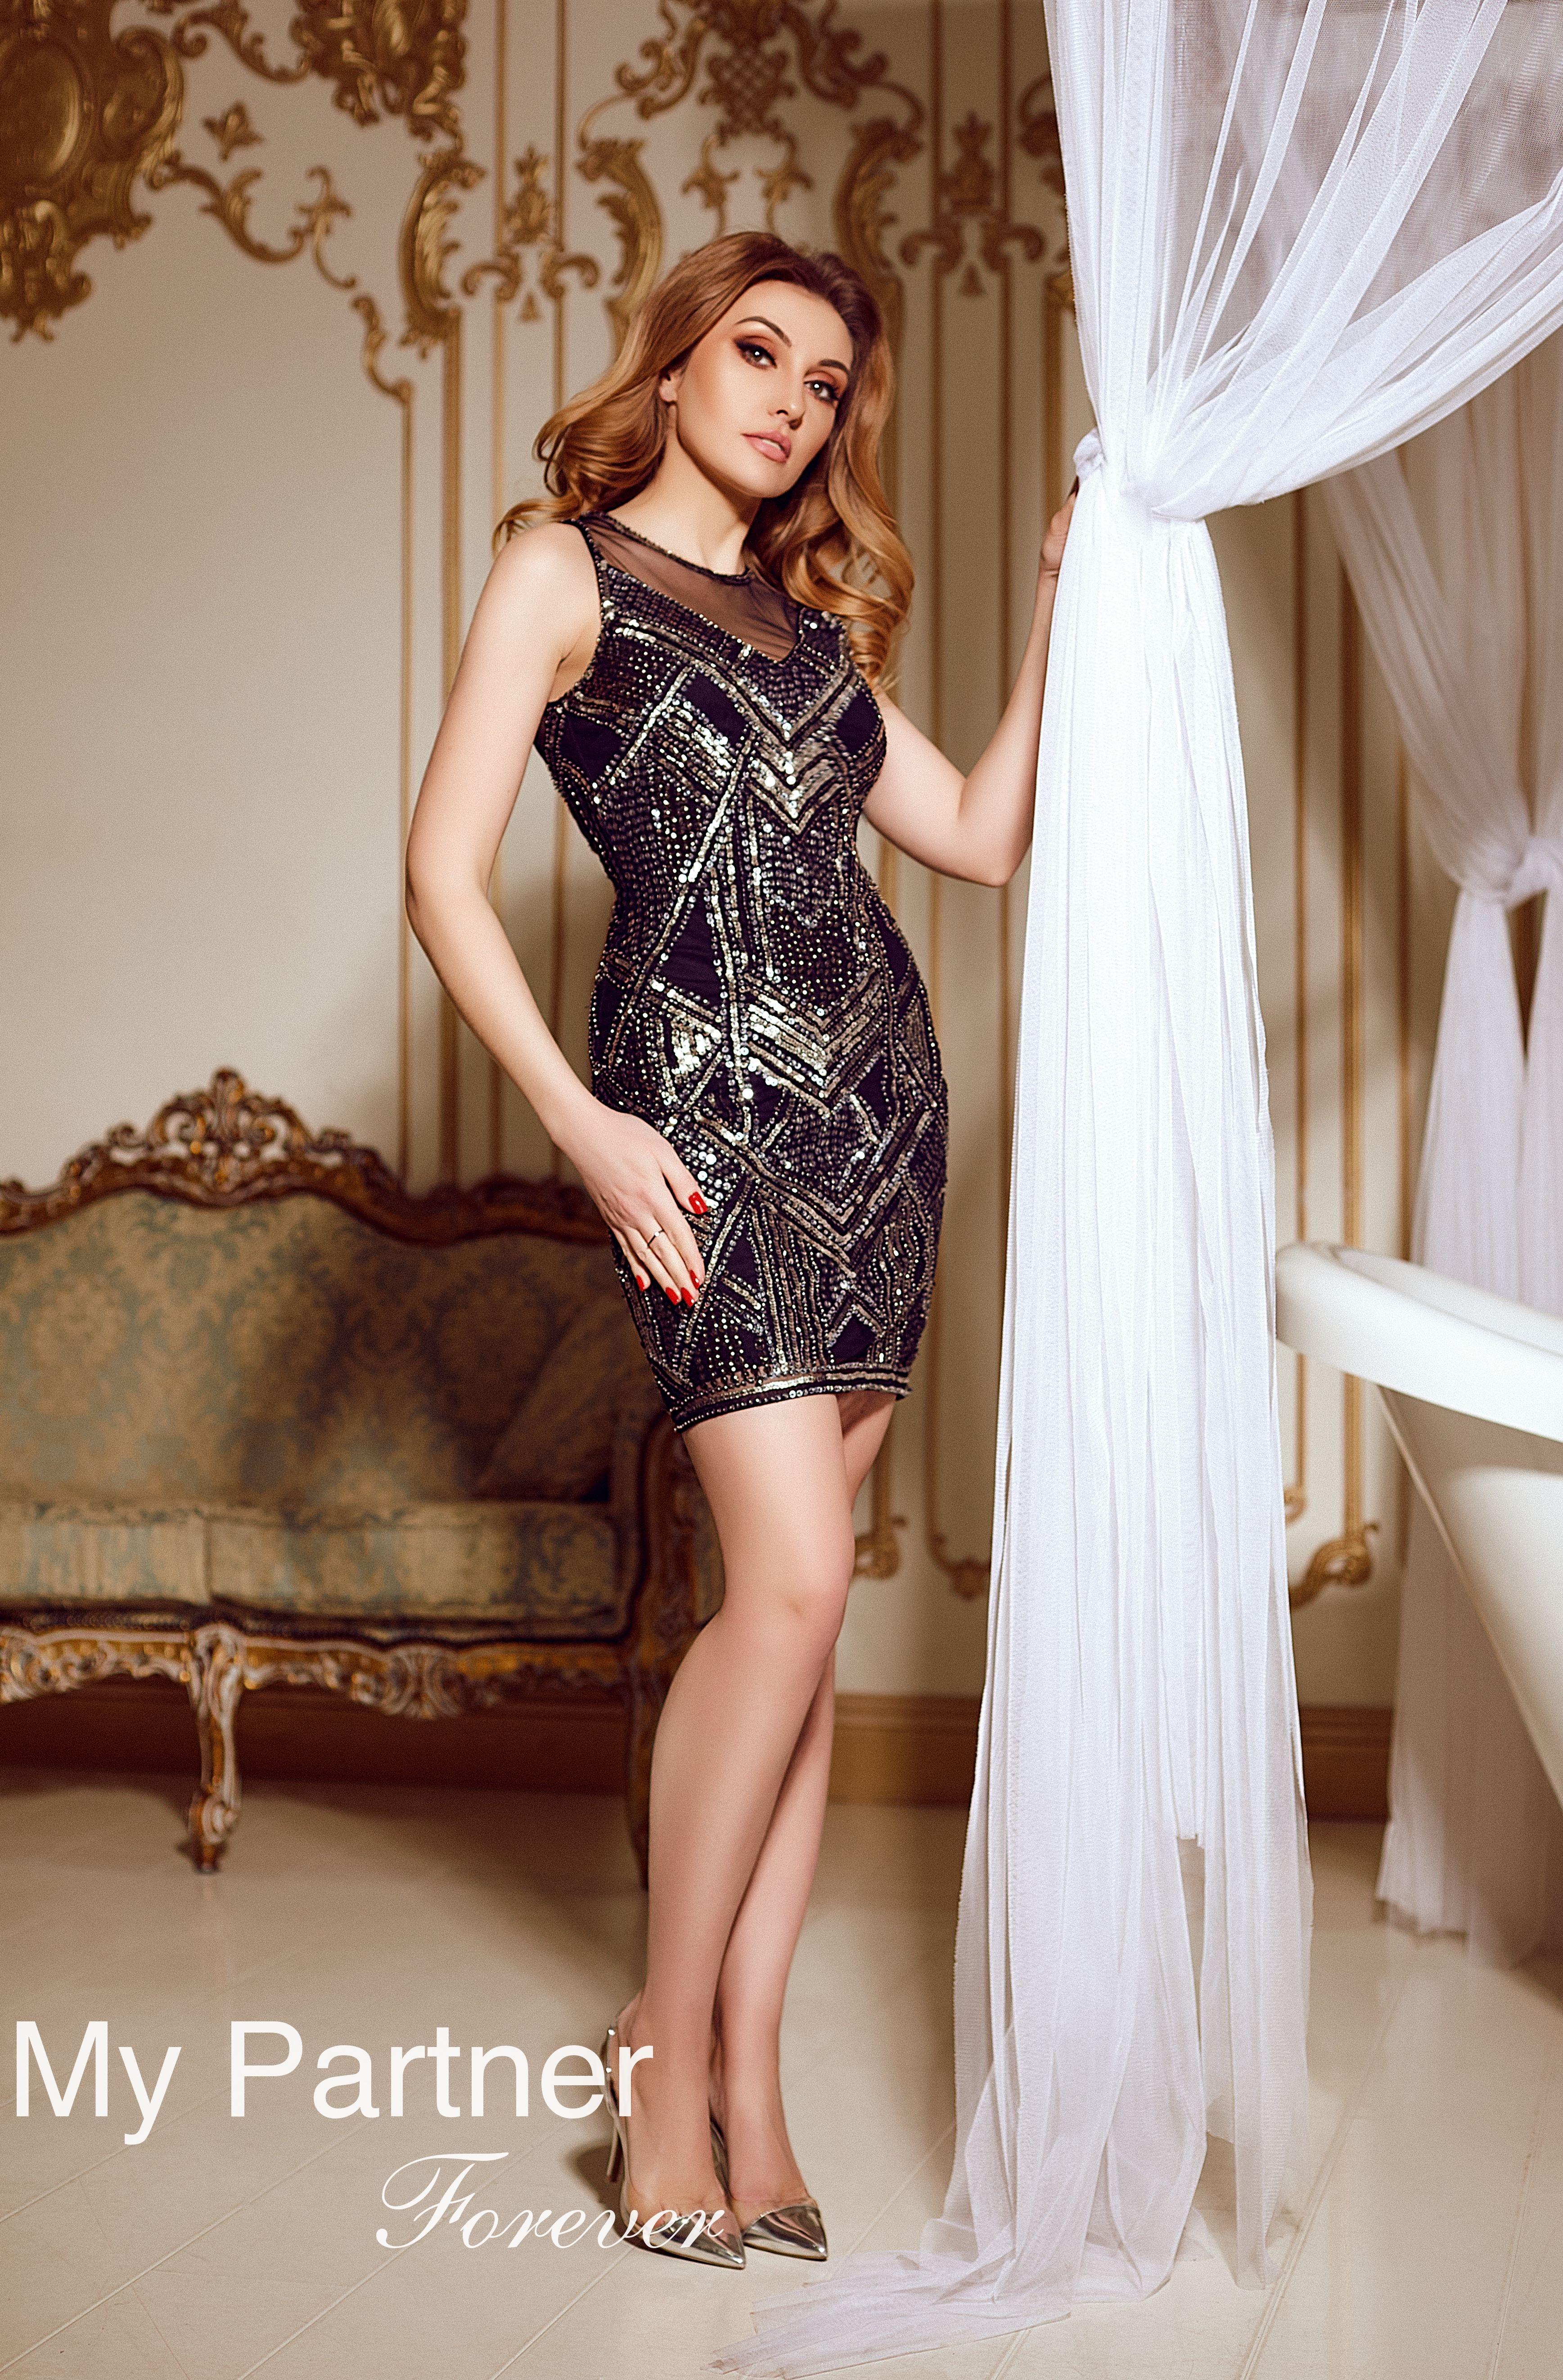 Online Dating with Single Ukrainian Woman Elena from Kiev, Ukraine